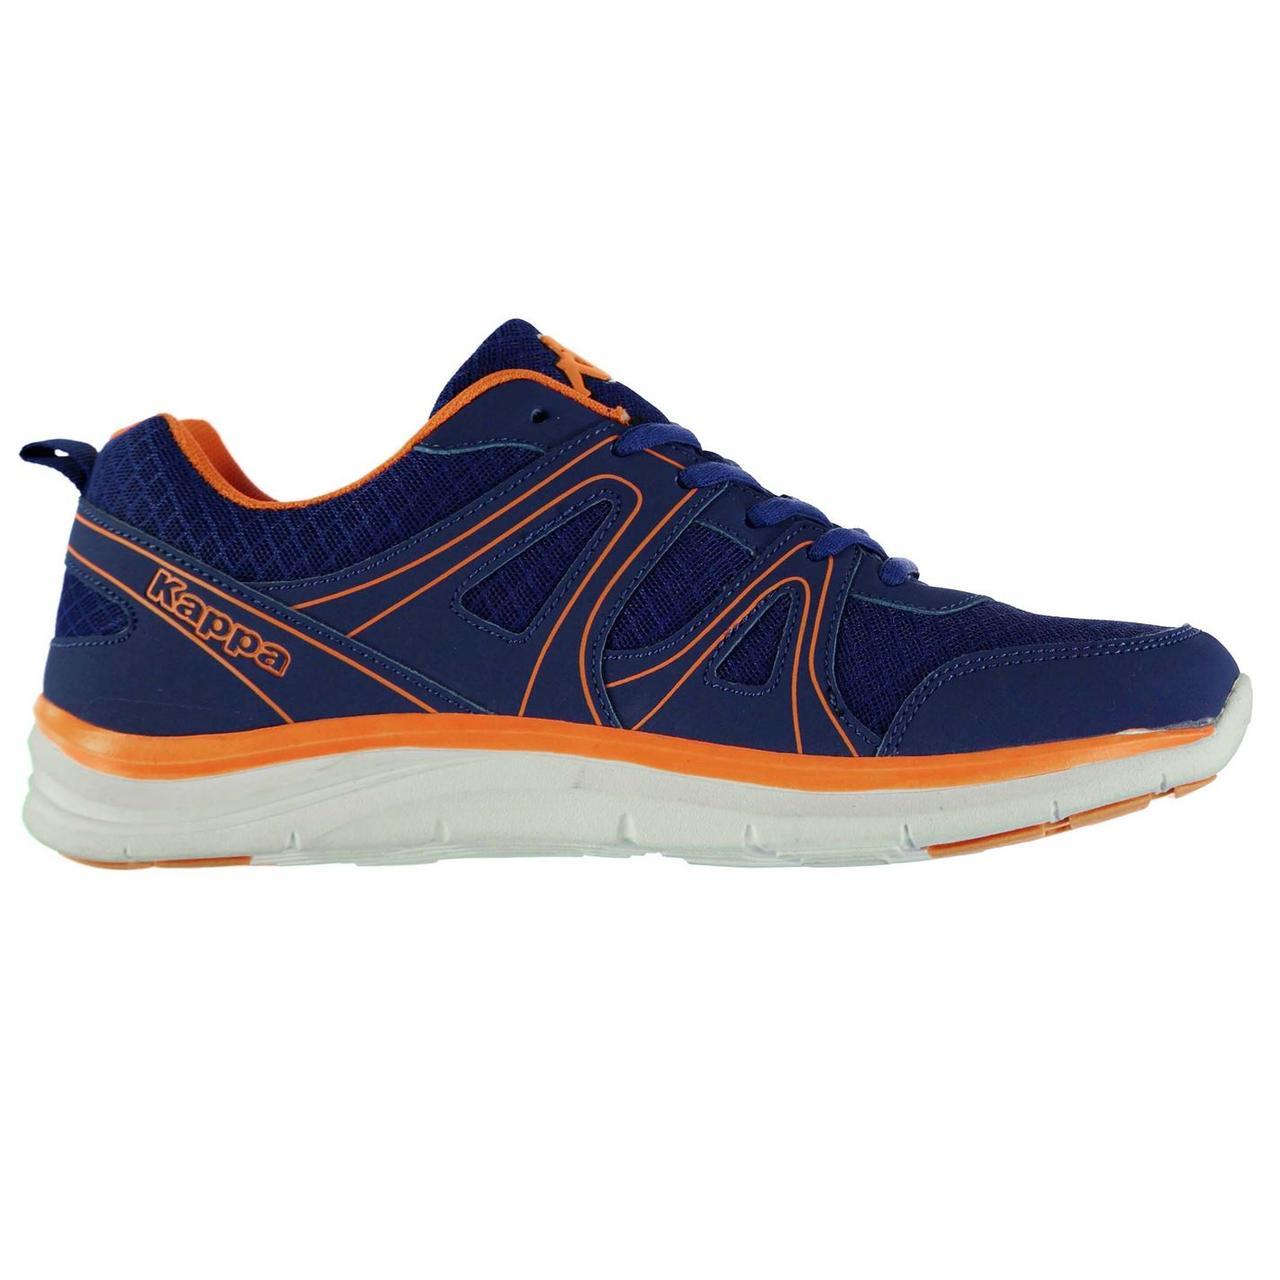 4e82d4e2 Кроссовки Kappa Dexter Mens Trainers 46 (30.3 см) Синие (129010-R ...